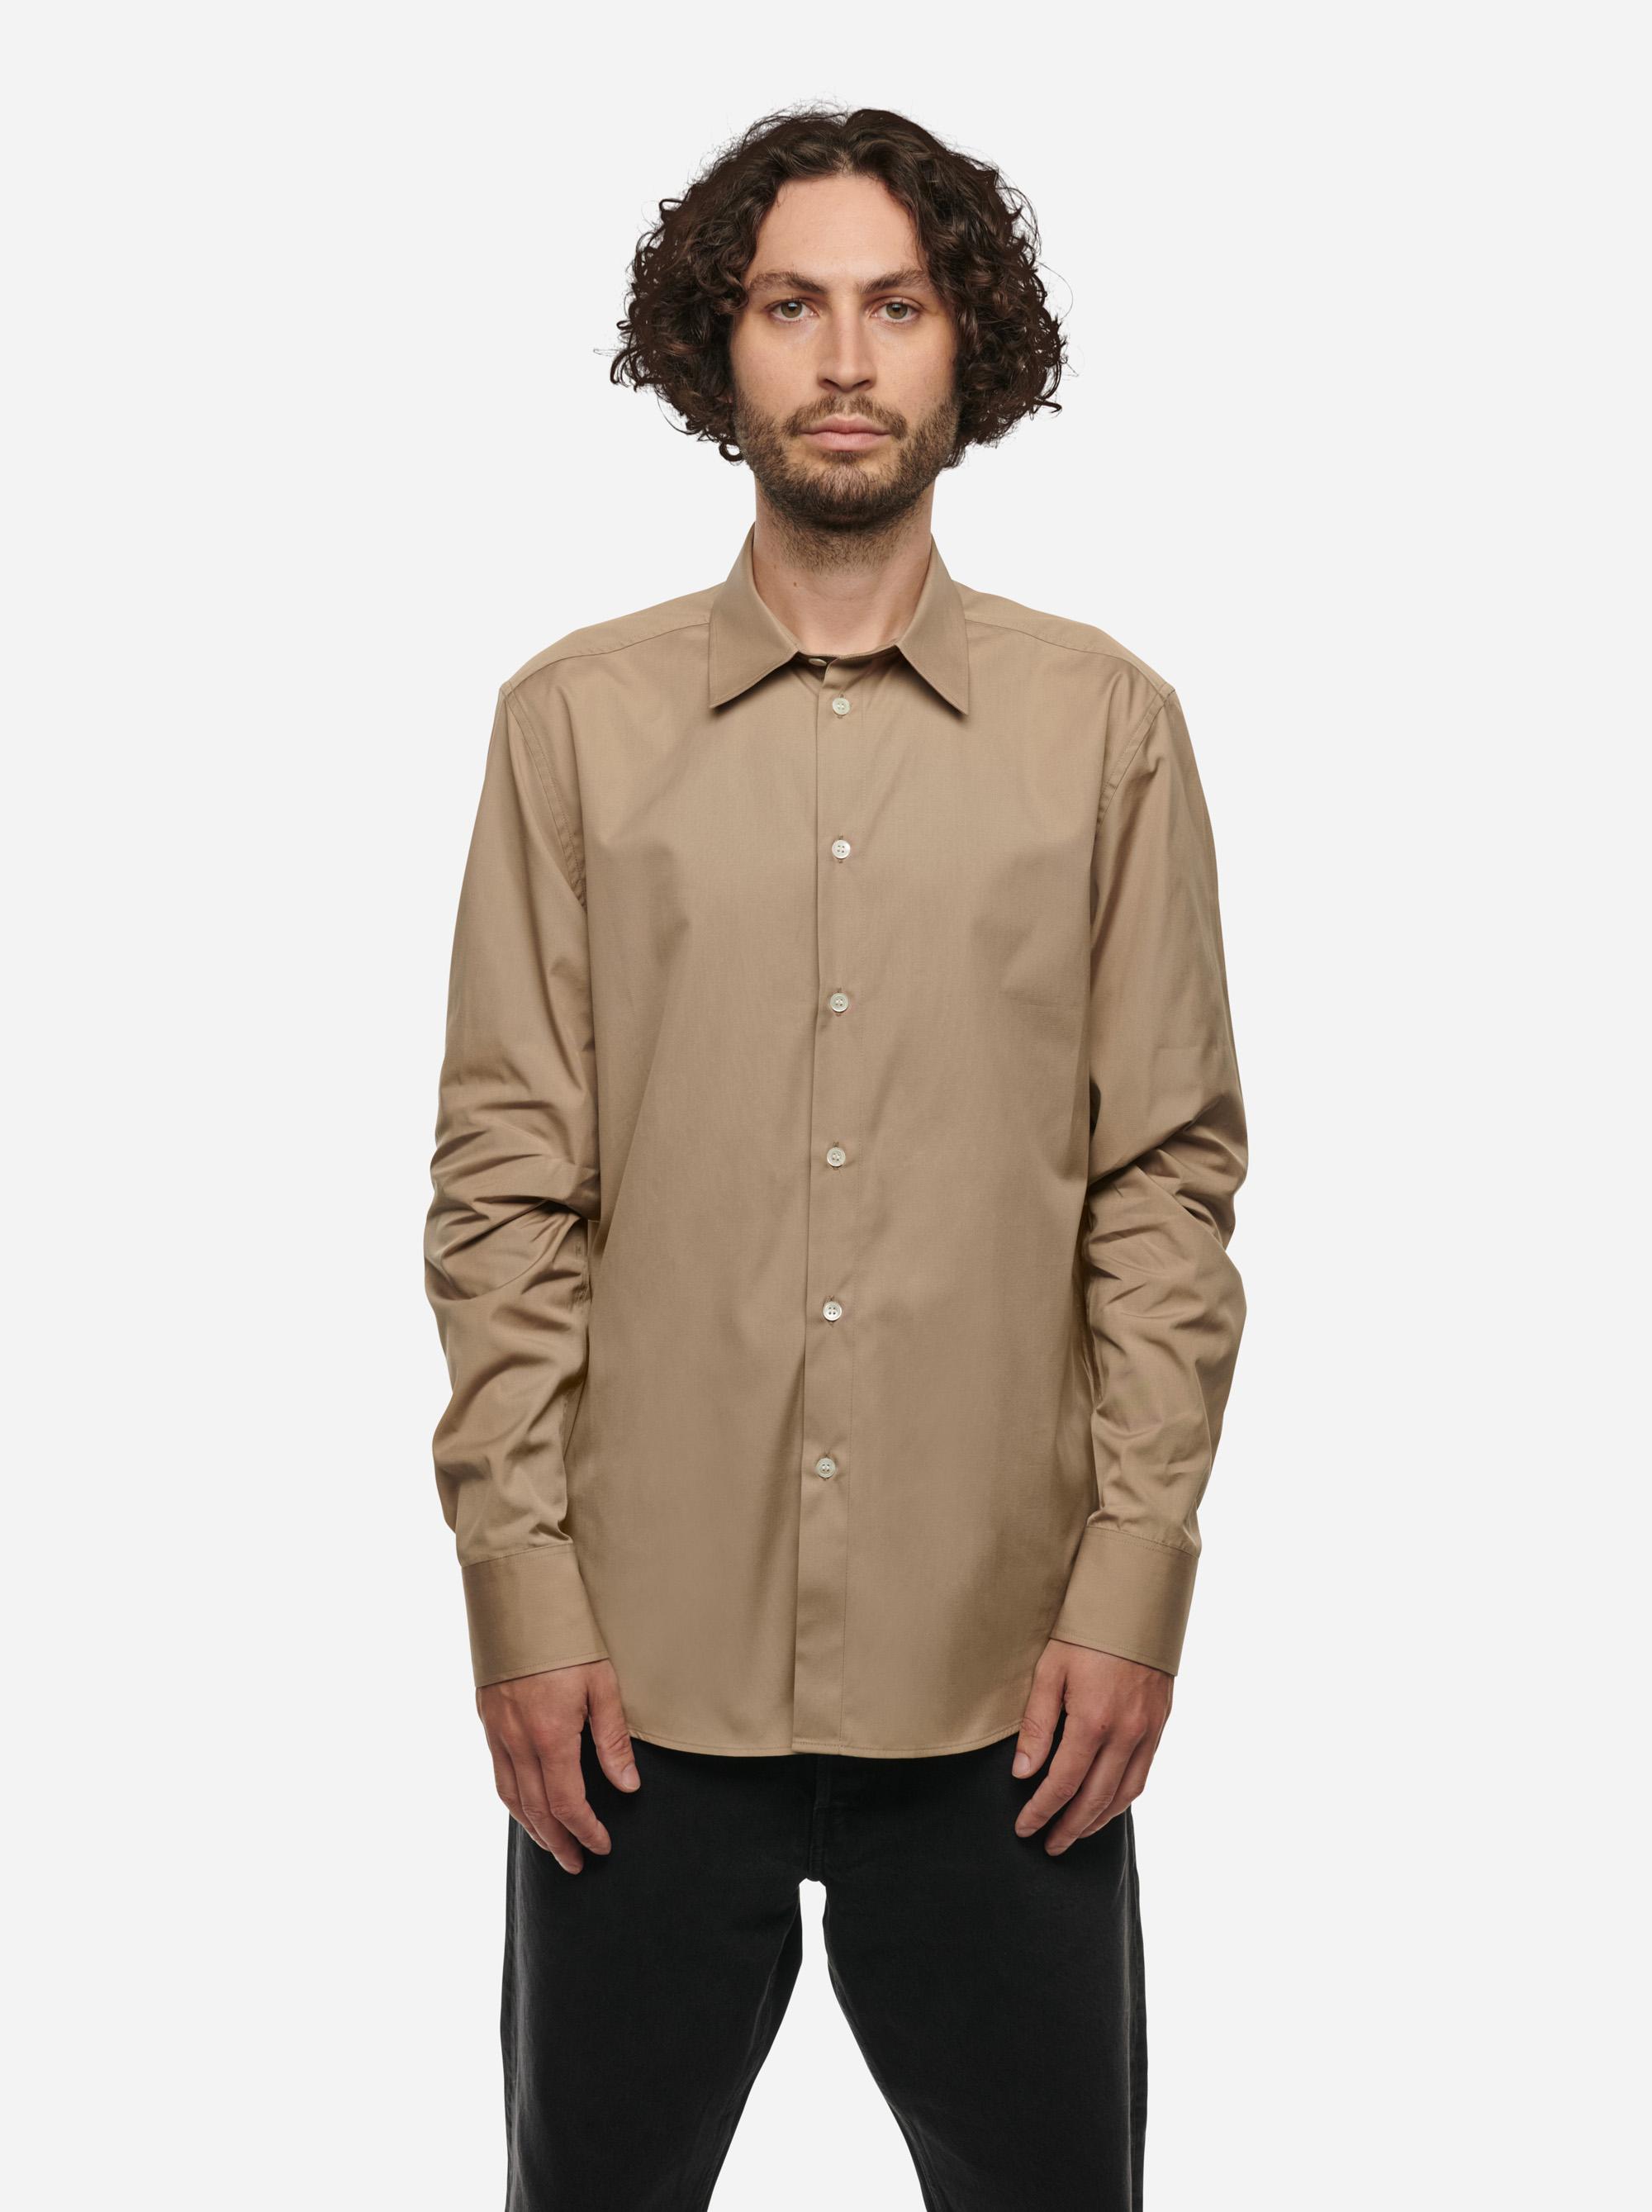 Teym - The Shirt - Men - Beige - 1